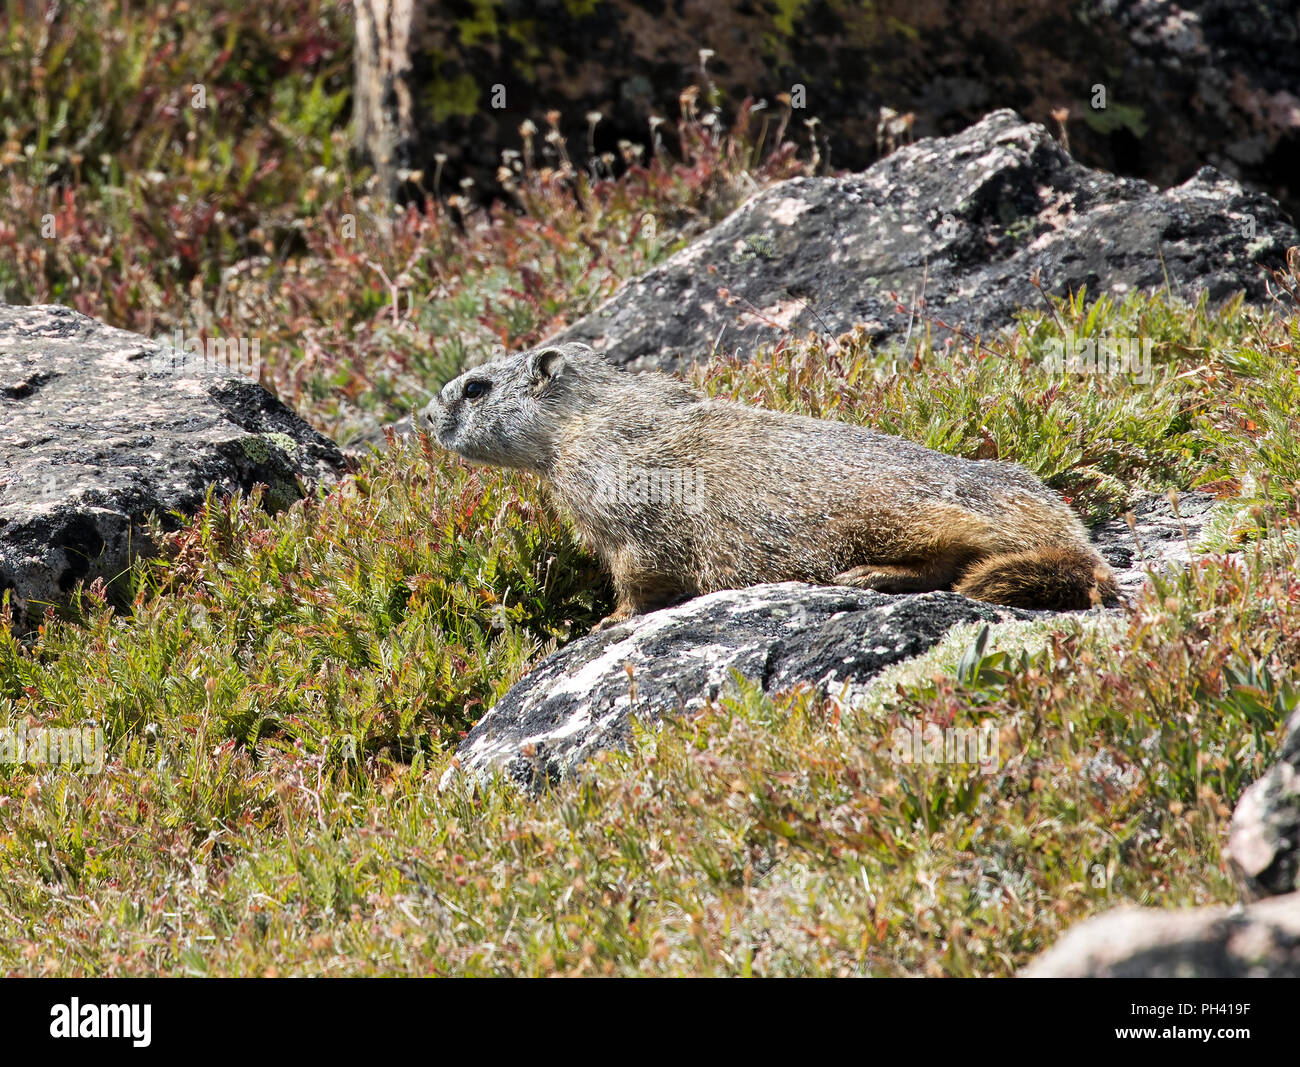 Yellow Bellied Marmot, Marmota flaviventris, Beartooth Scenic Highway, Wyoming, USA - Stock Image